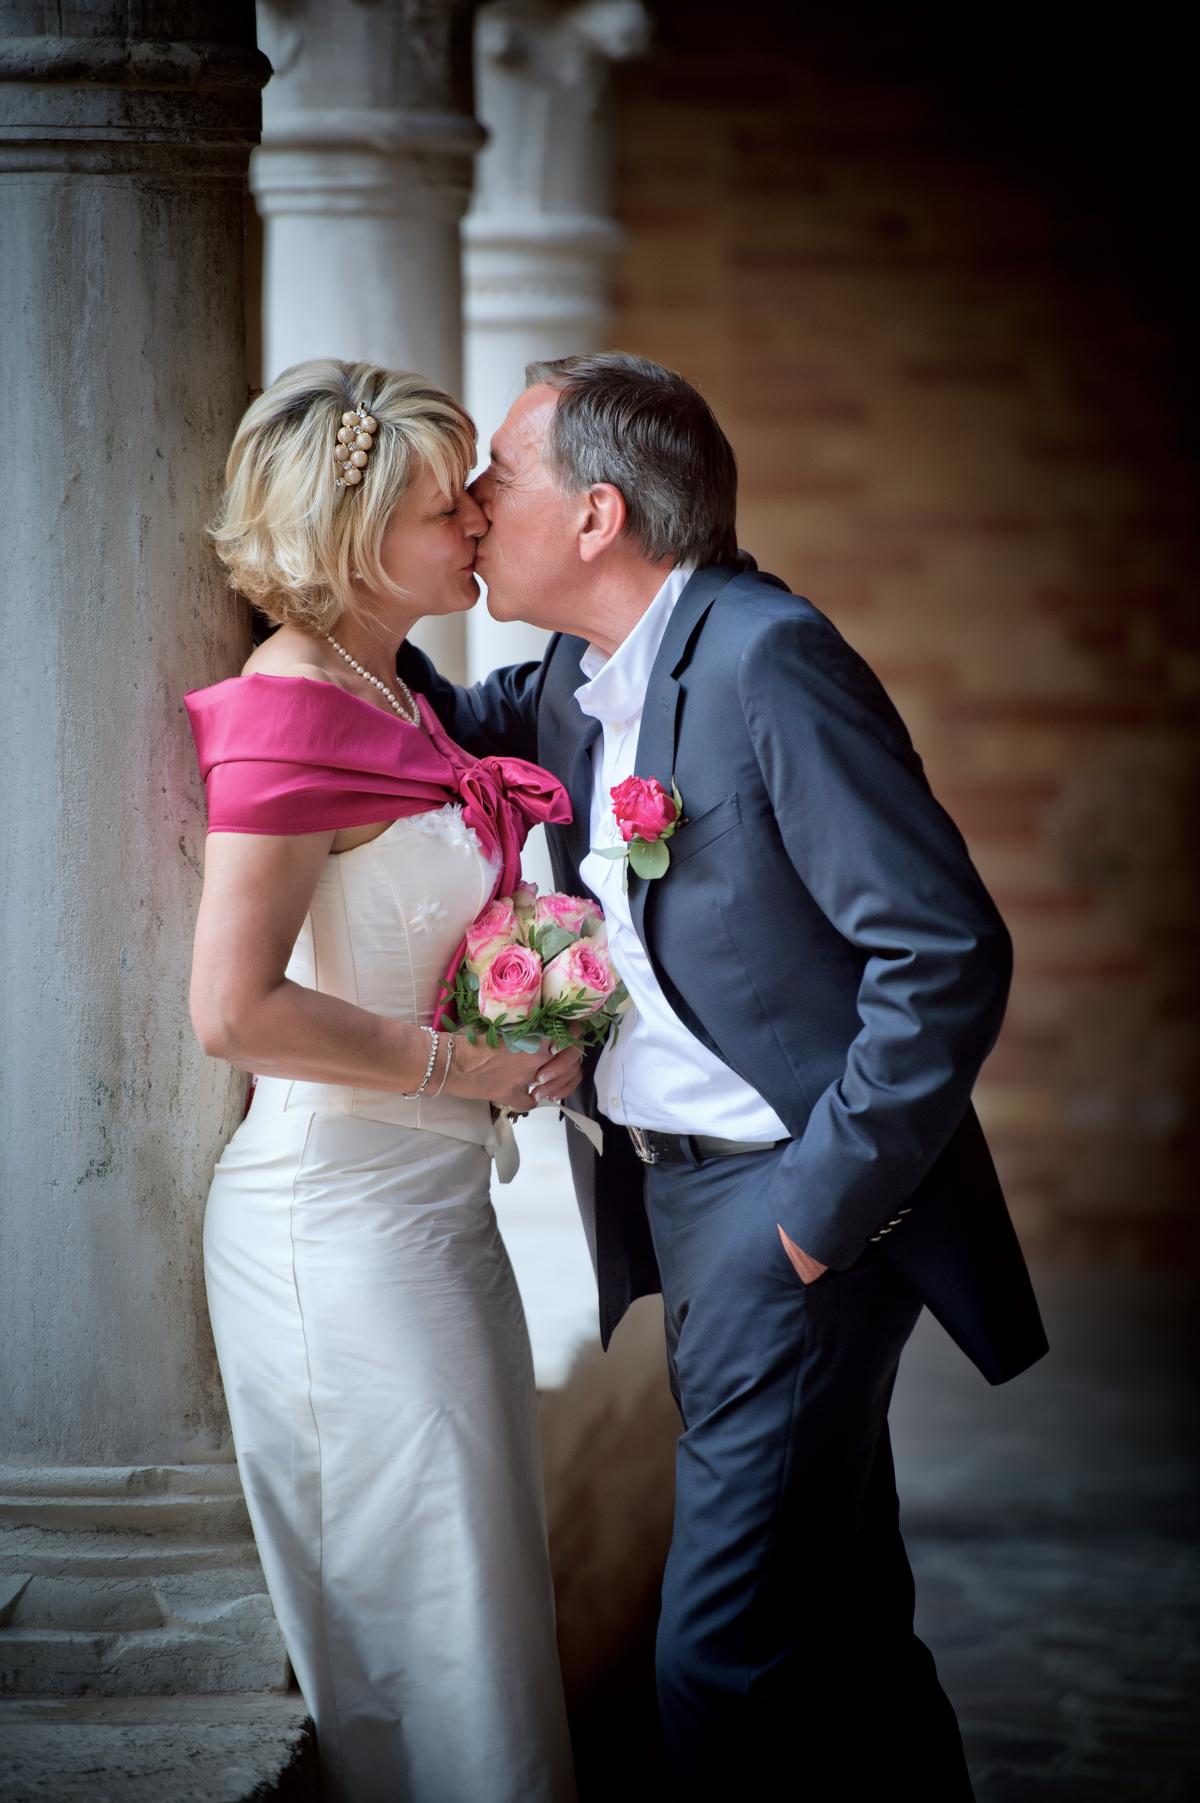 photographer wedding venice photographe mariage venise laure jacquemin (102).jpg